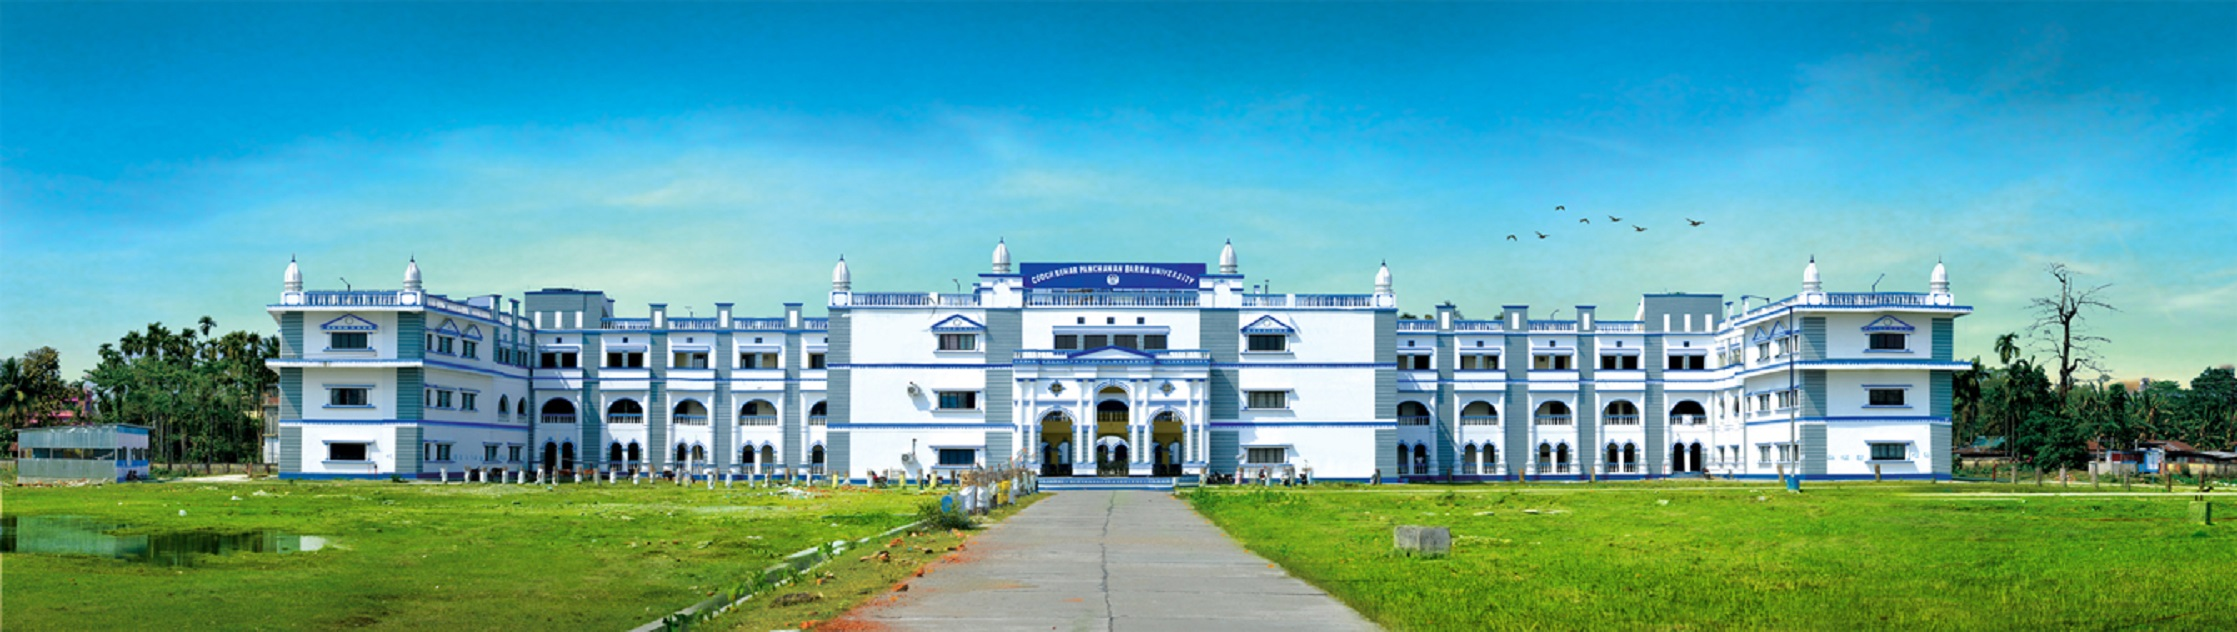 CBPBU (Cooch Behar Panchanan Barma University) Image